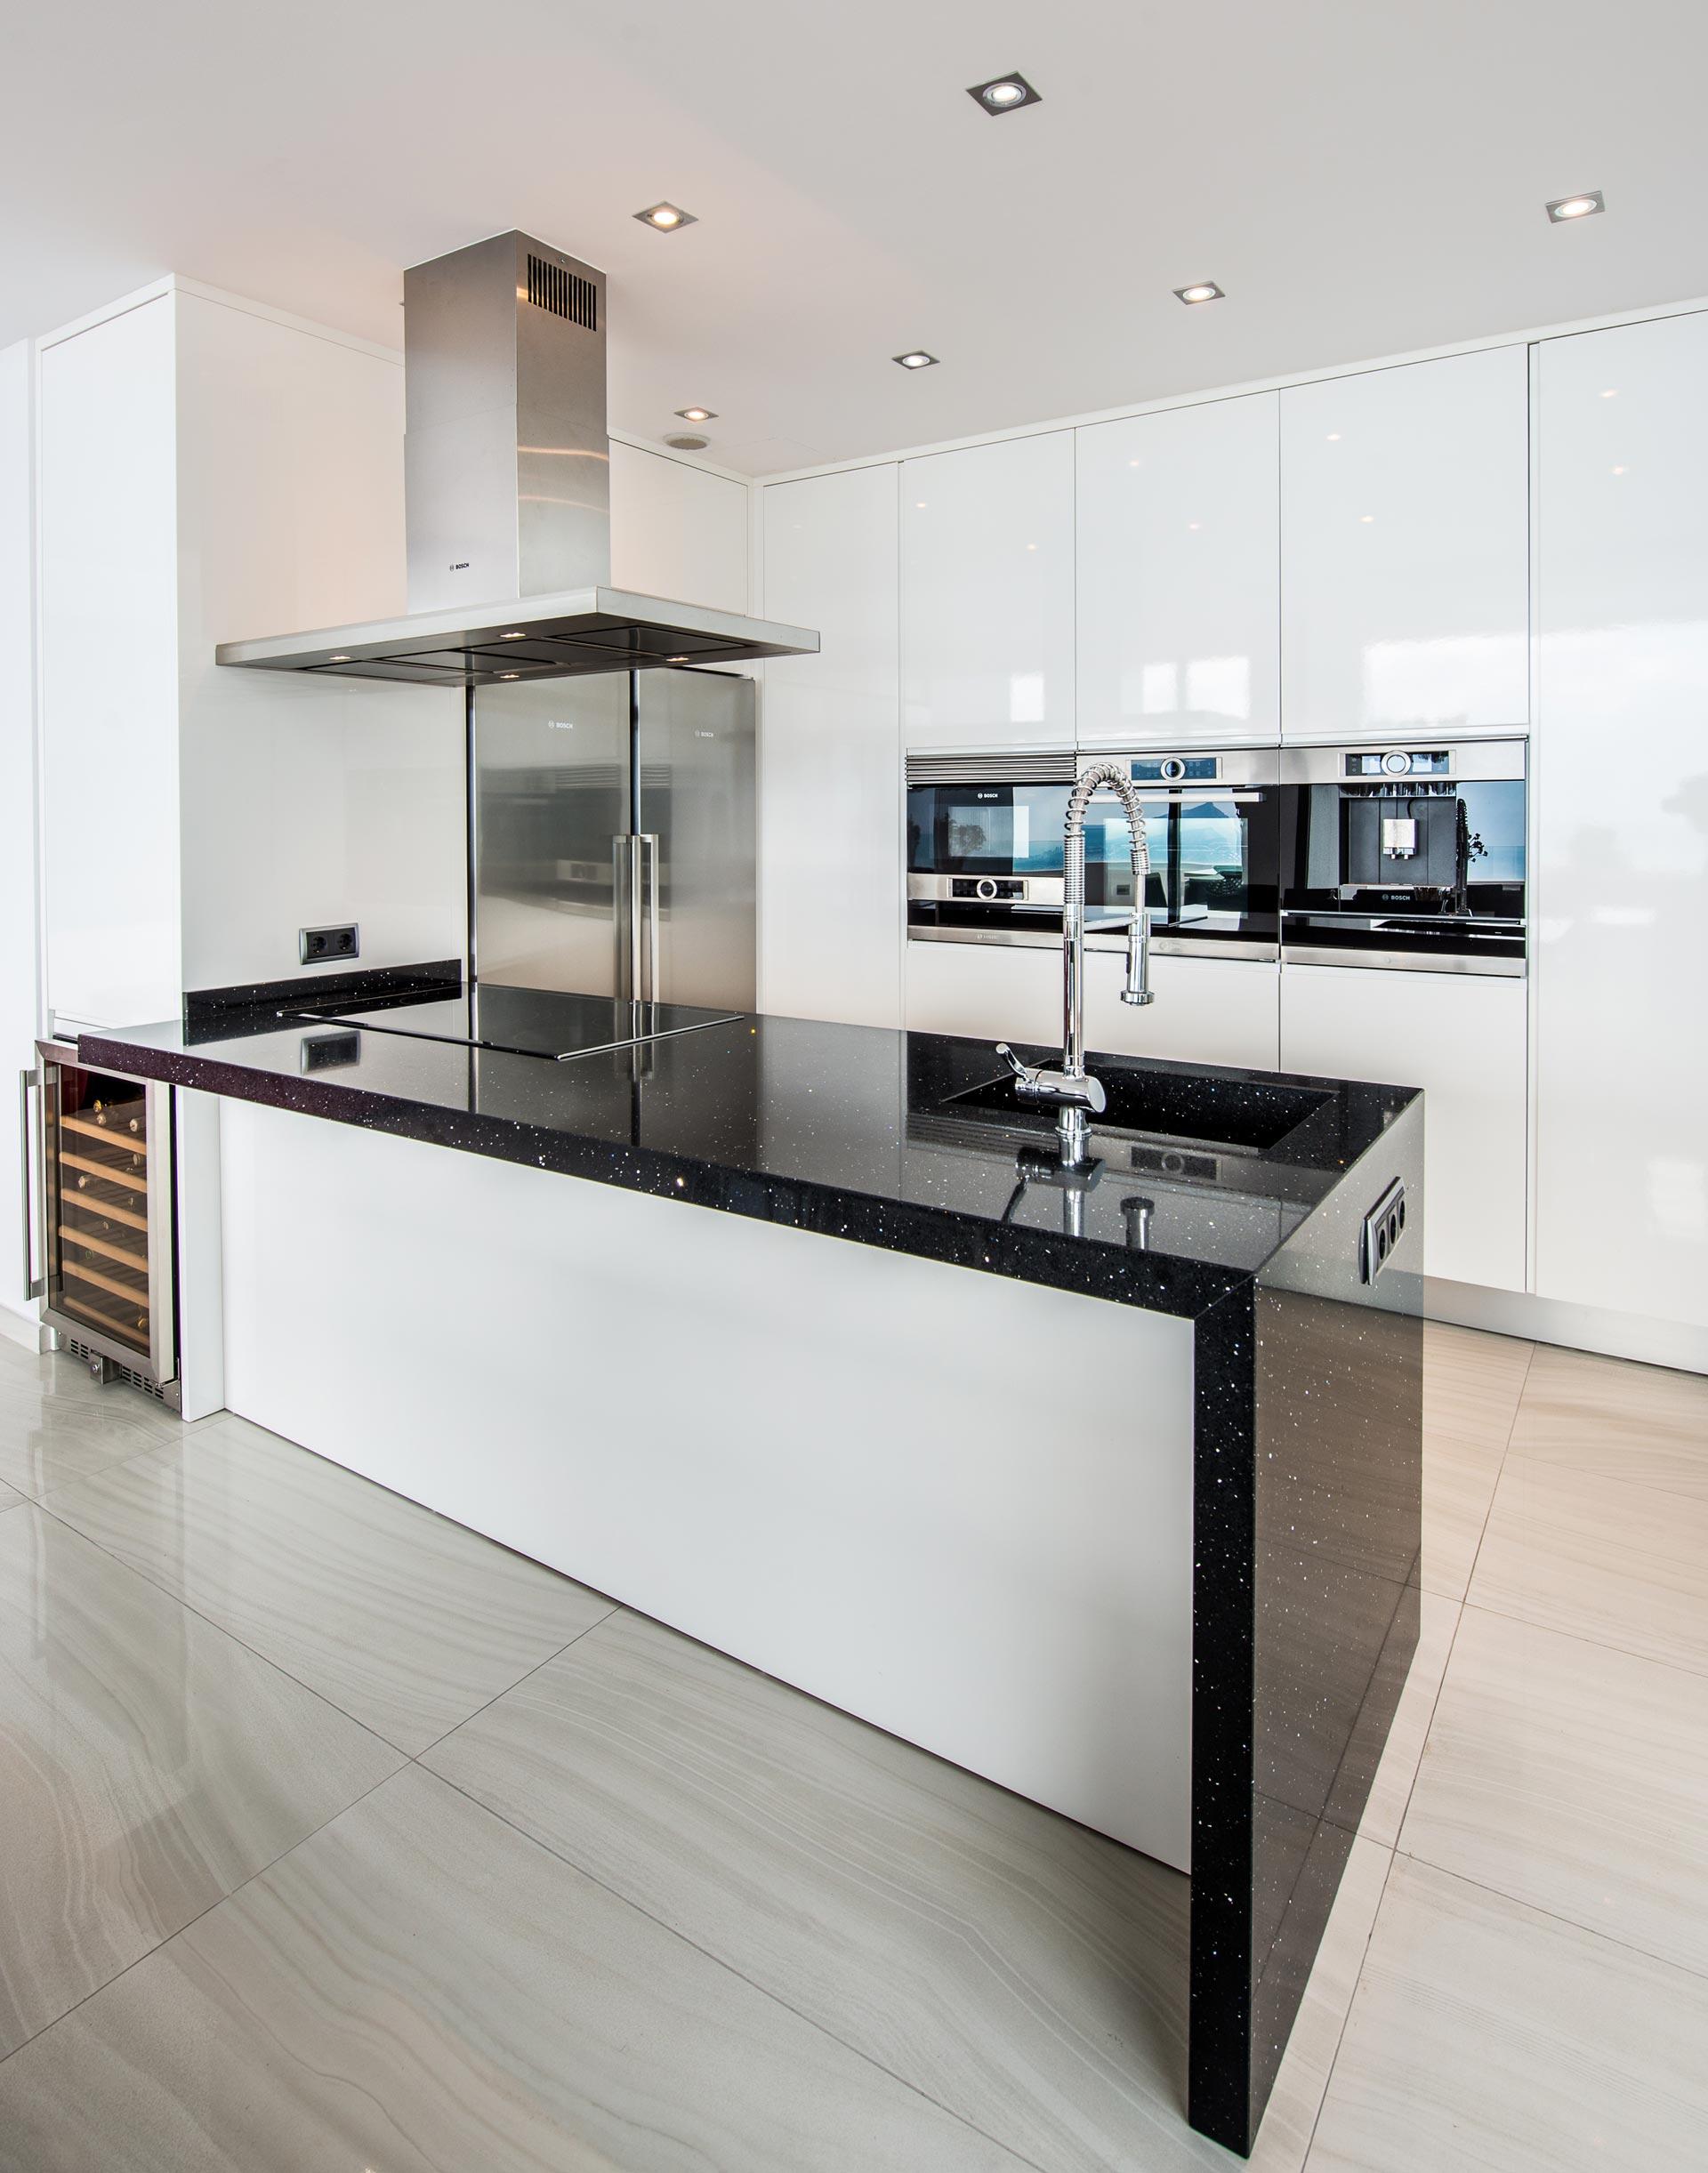 Empresas fabricas fabricantes muebles mobiliario cocinas a - Muebles de cocina en castellon ...